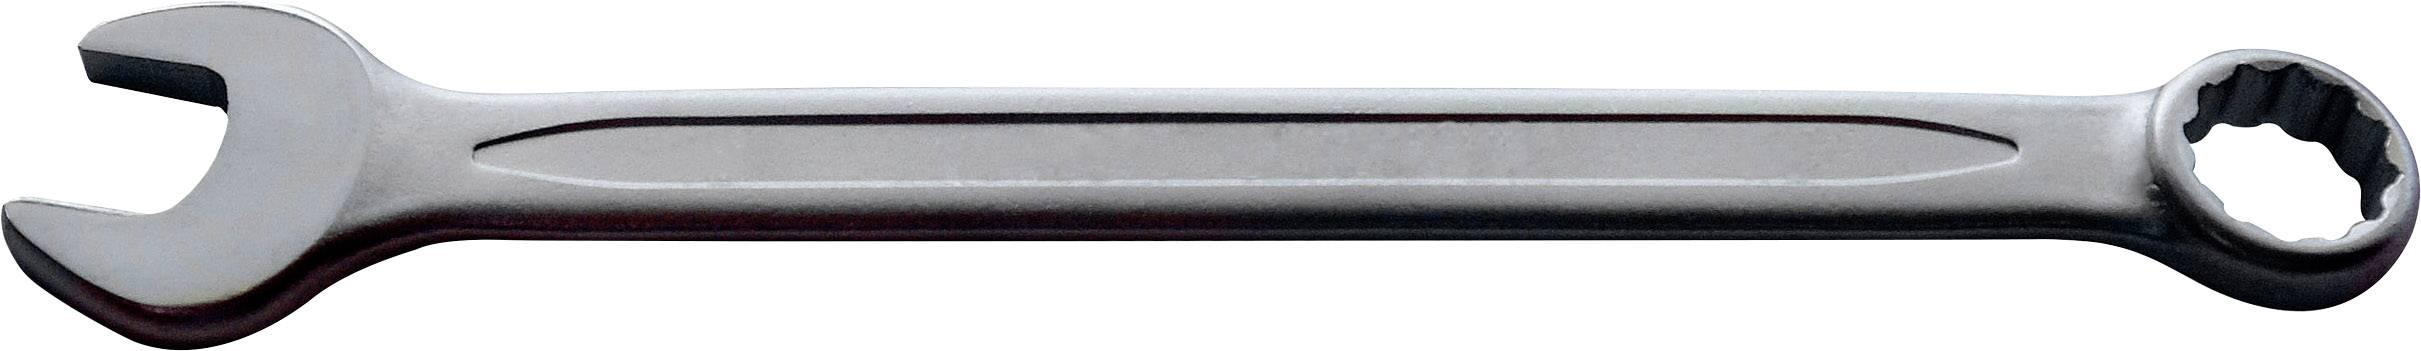 Očkoplochý klíč TOOLCRAFT 820835, N/A, 11 mm